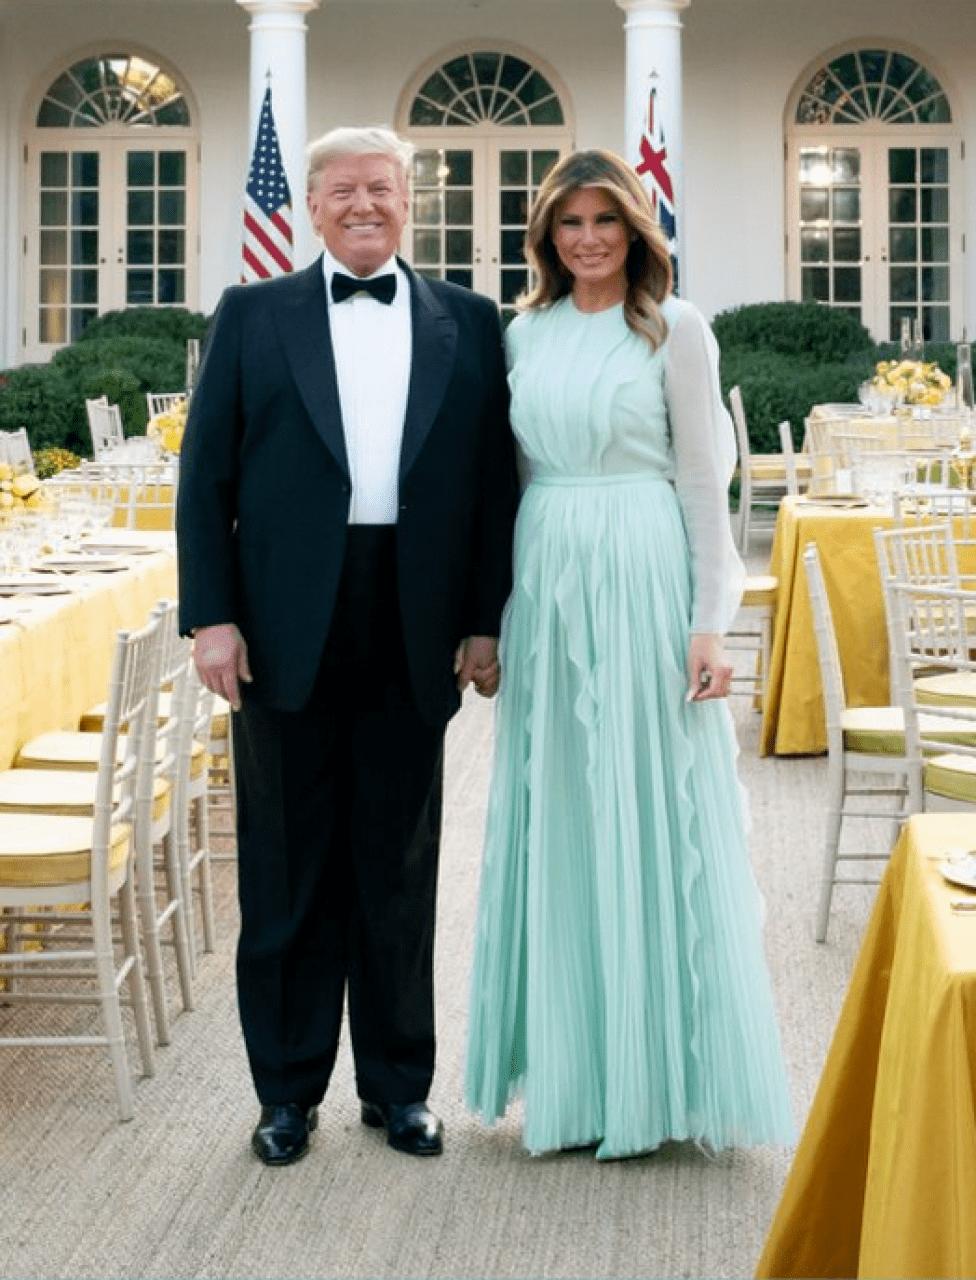 Melania Trump Australian Prime Minister Sept 20 2019 Pastel Green frock